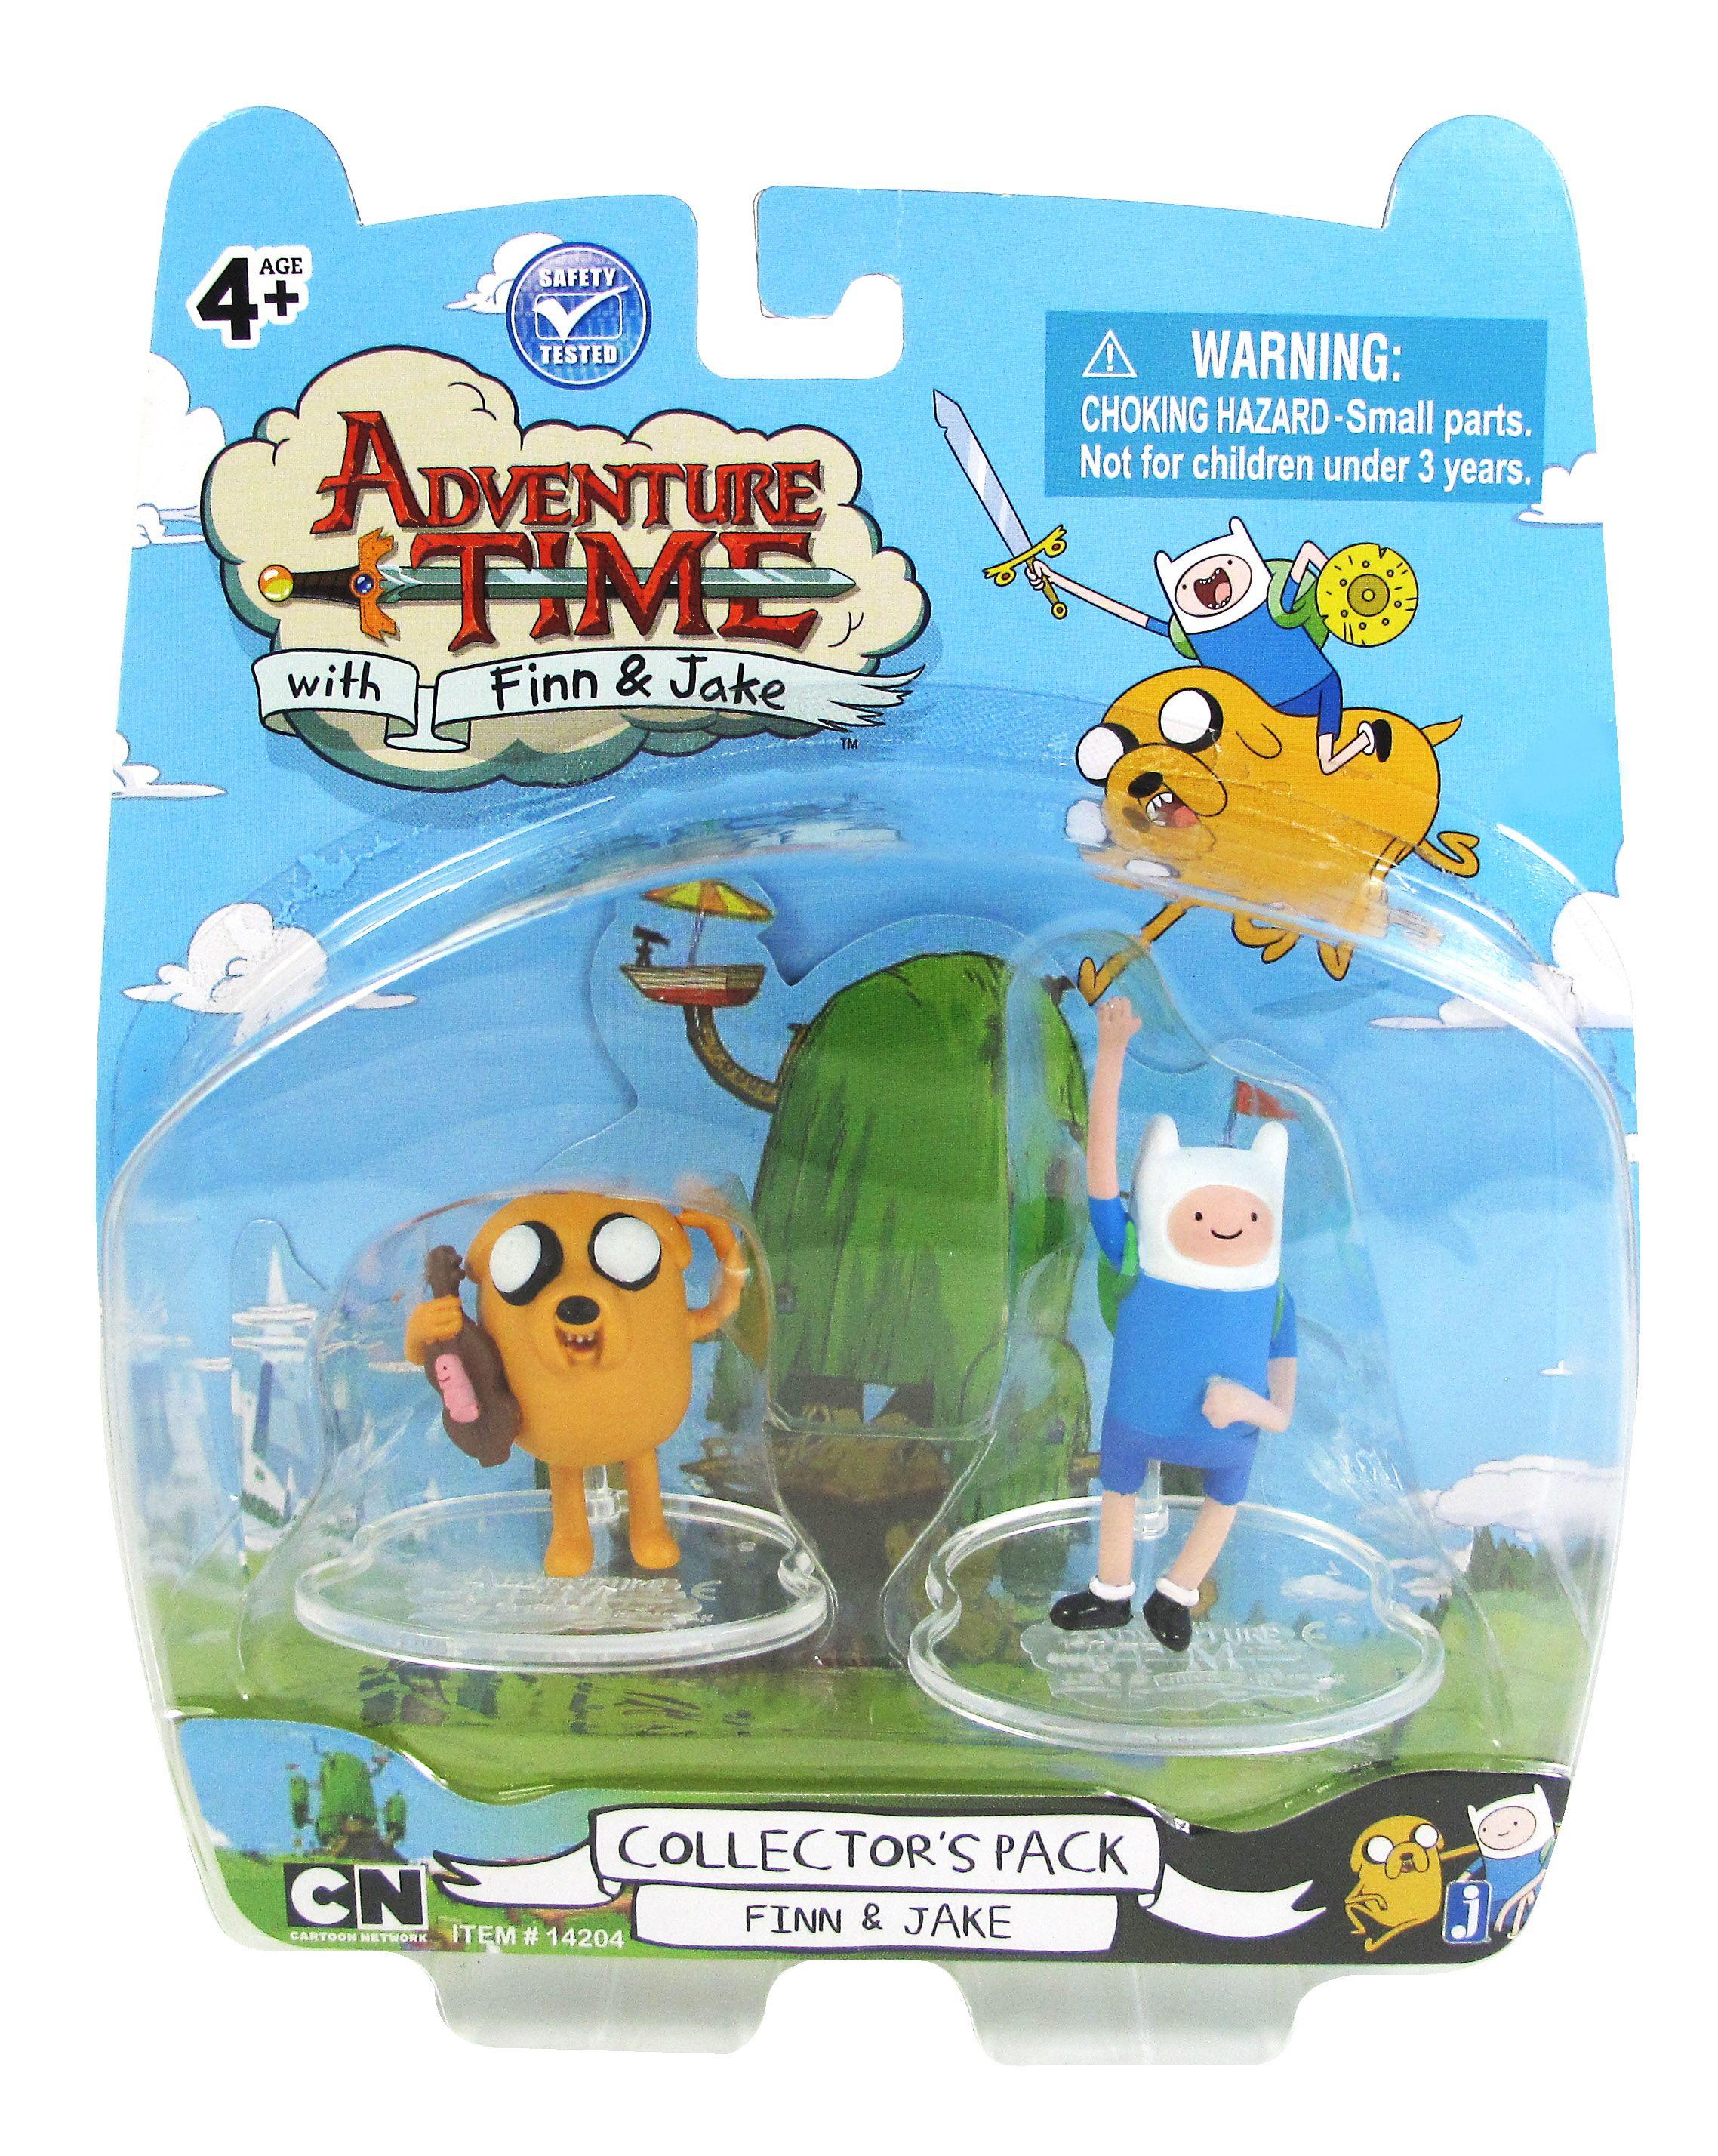 New ADVENTURE TIME Cartoon Network MINI TOY PLAYSET FIGURES COMPLETE SET 4 FINN!